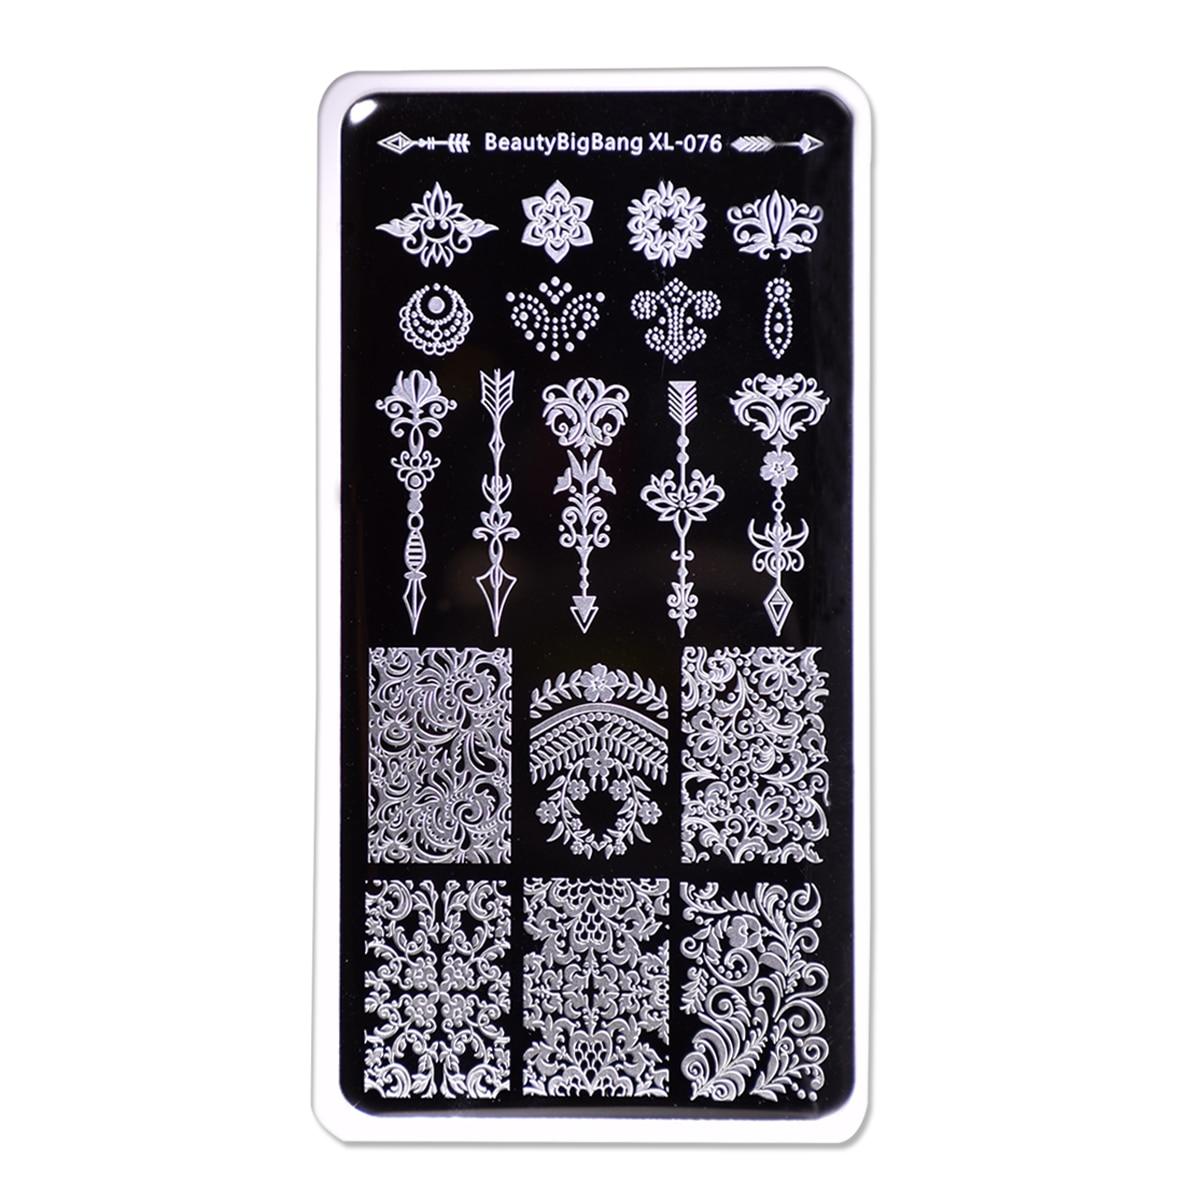 dandelion cogumelo unicórnio imagem molde da arte